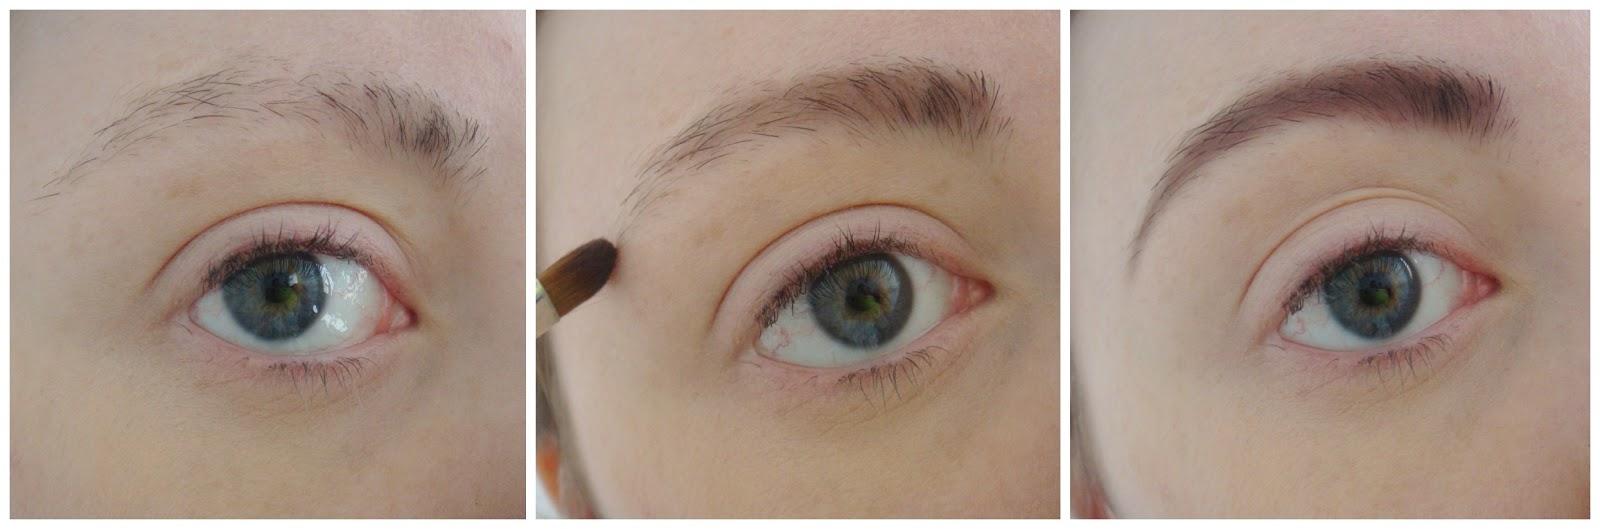 Ruth Boon: Make-up Tips for Trichotillomania: Eyebrows